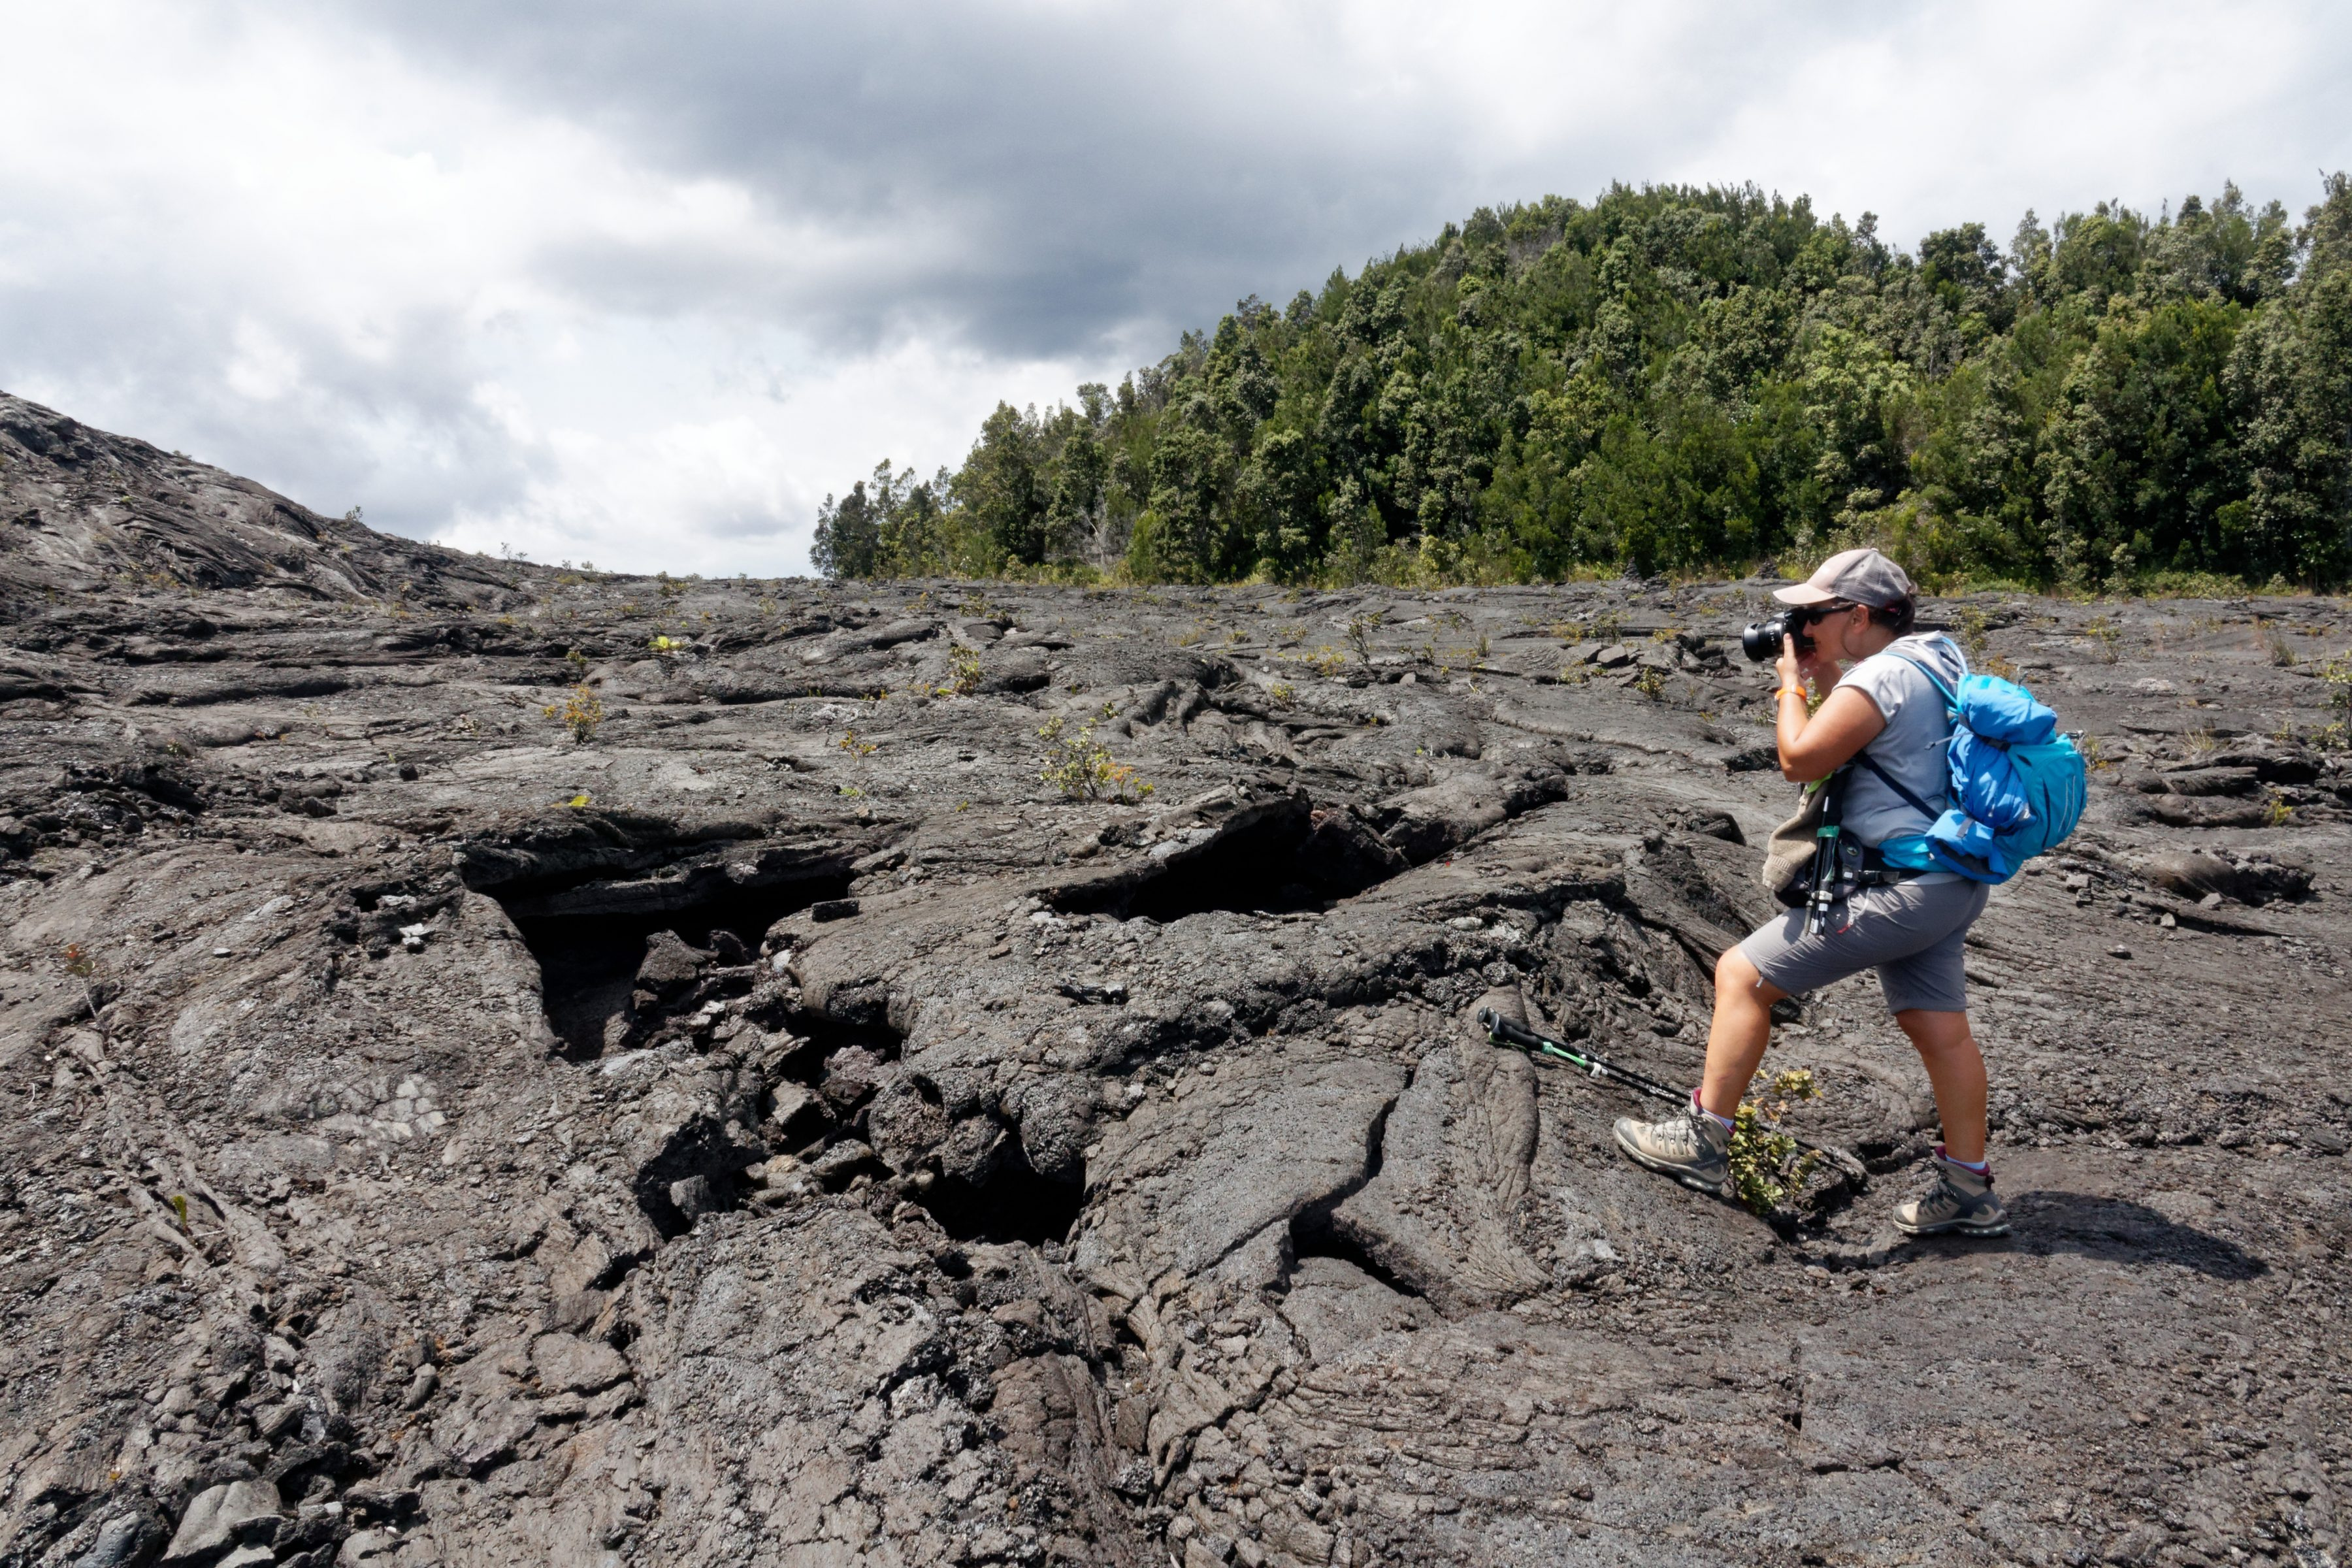 Le Pu'u Huluhulu à partir du sentier vers le Mauna Ulu